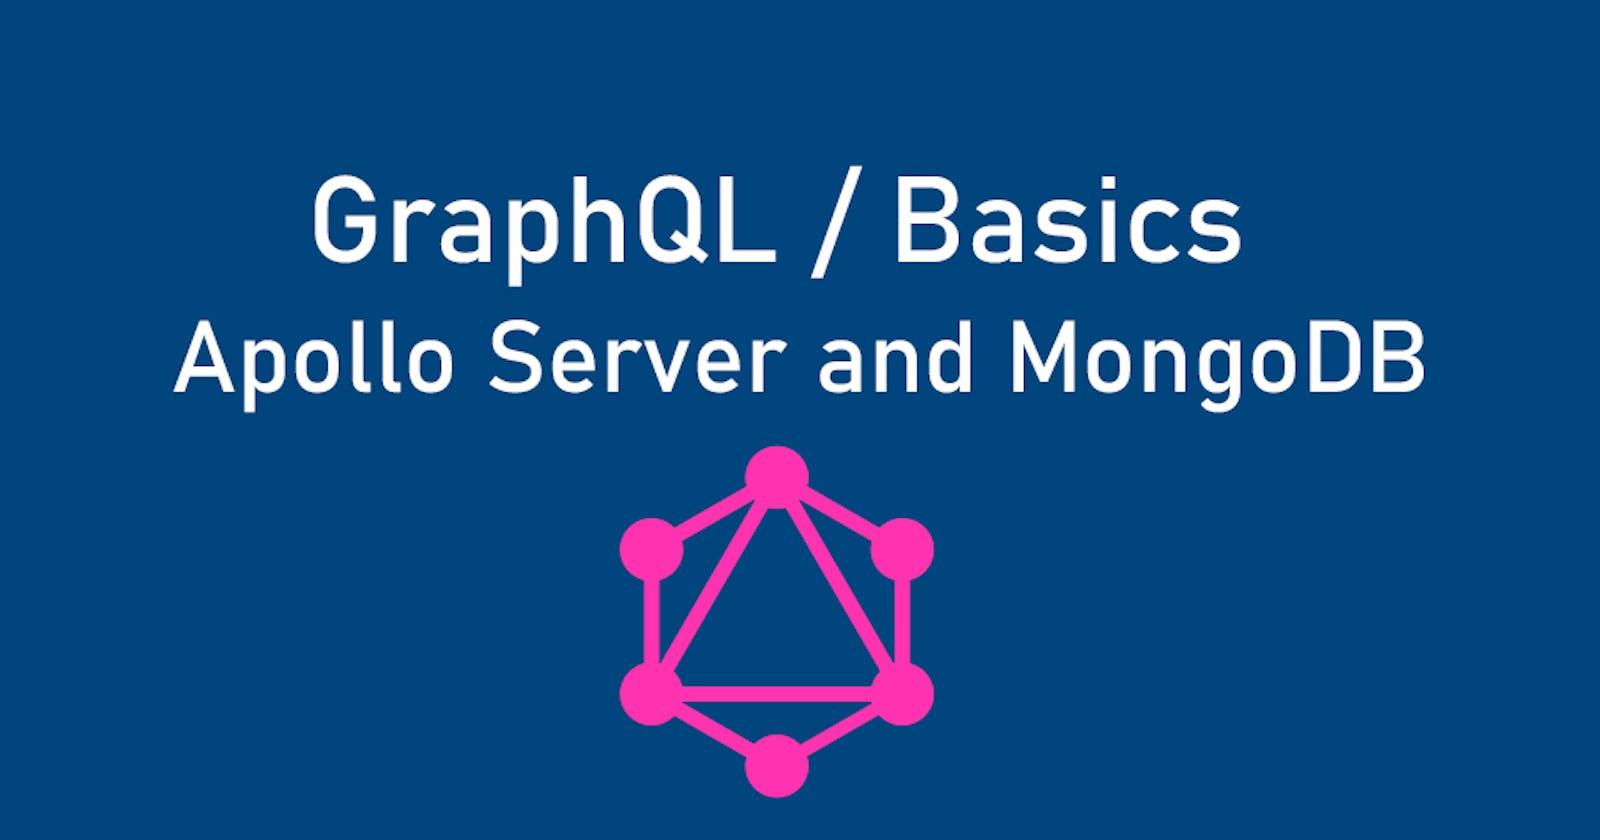 GraphQL basics. Part 4. Creating an Apollo Server with MongoDB Database